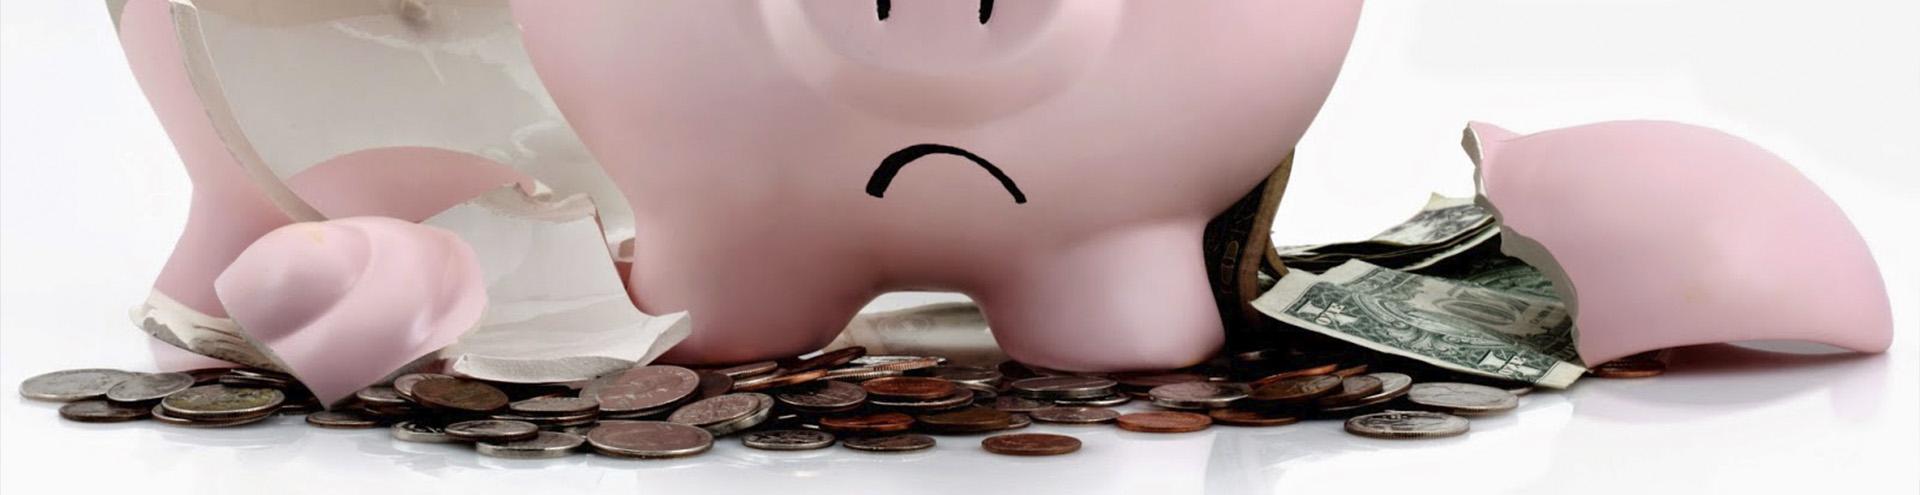 банкротство банка в Липецке